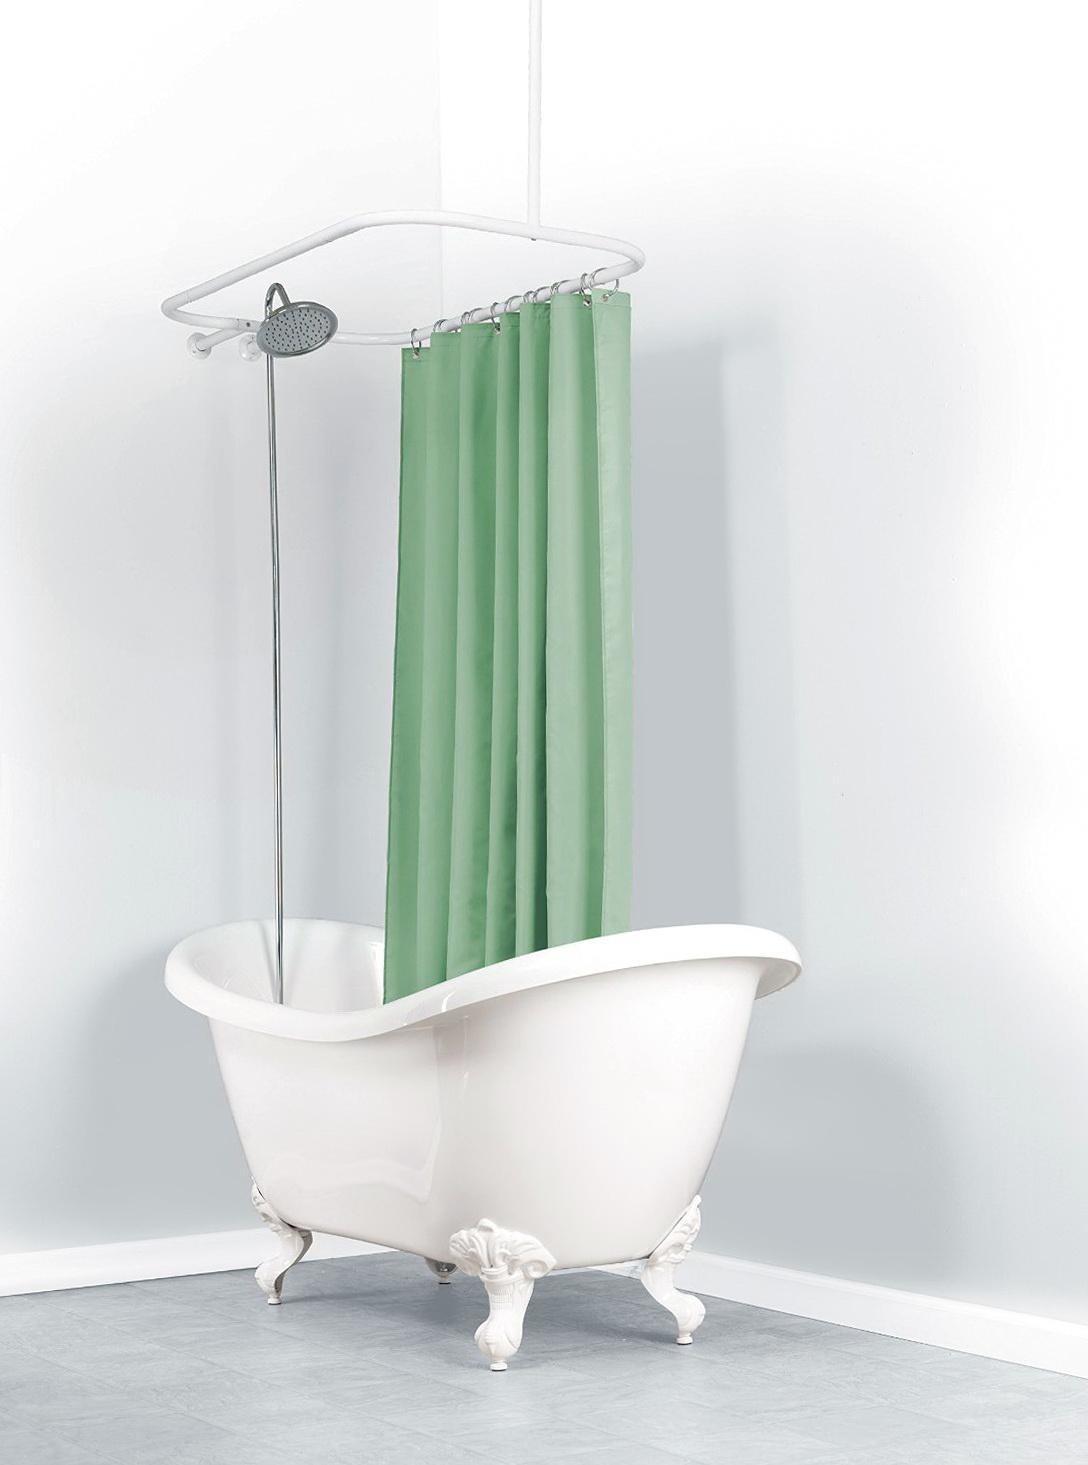 Oval Shower Curtain Rod Canada Home Design Ideas